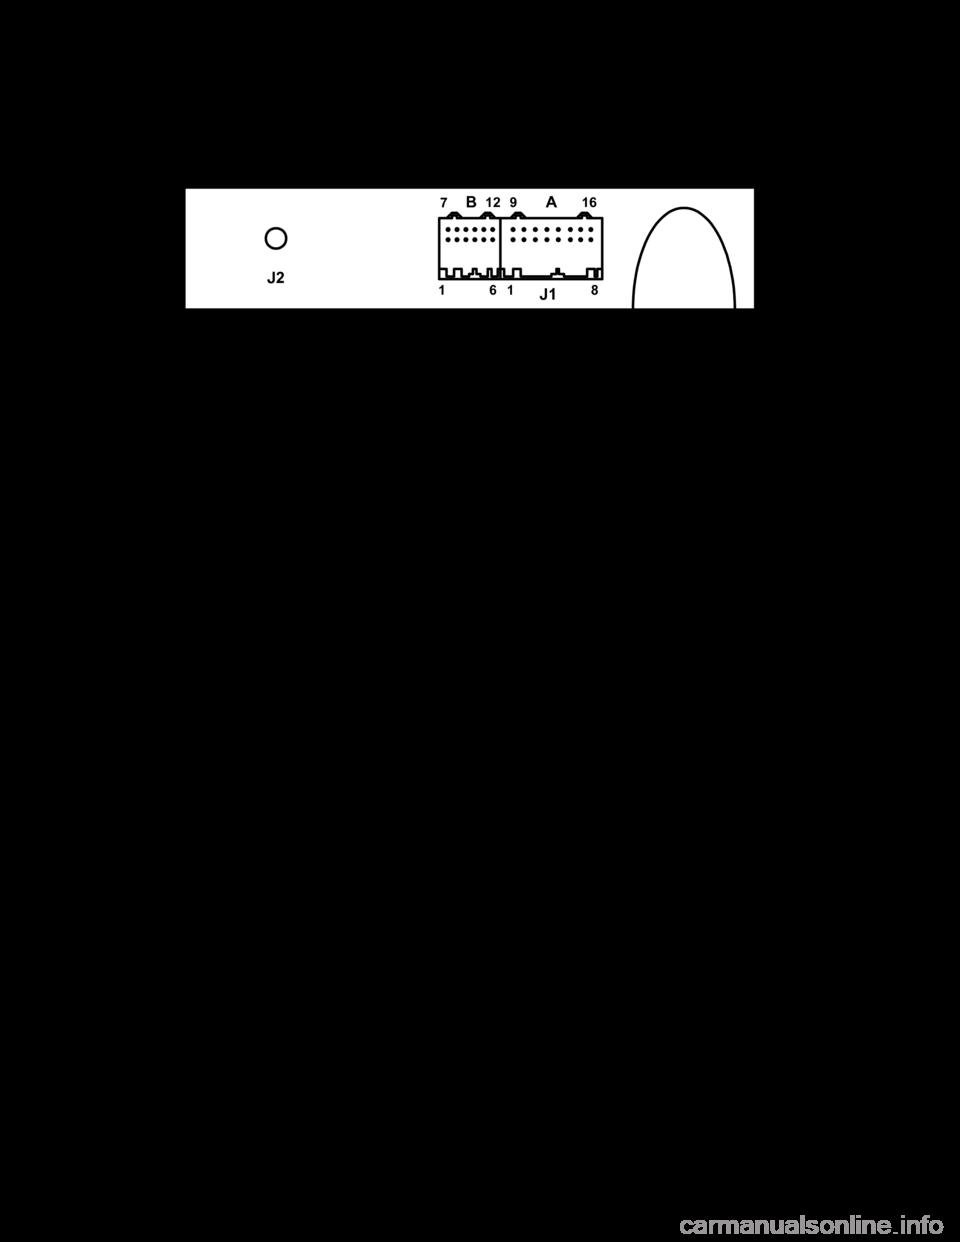 bmw e46 workshop manual free download